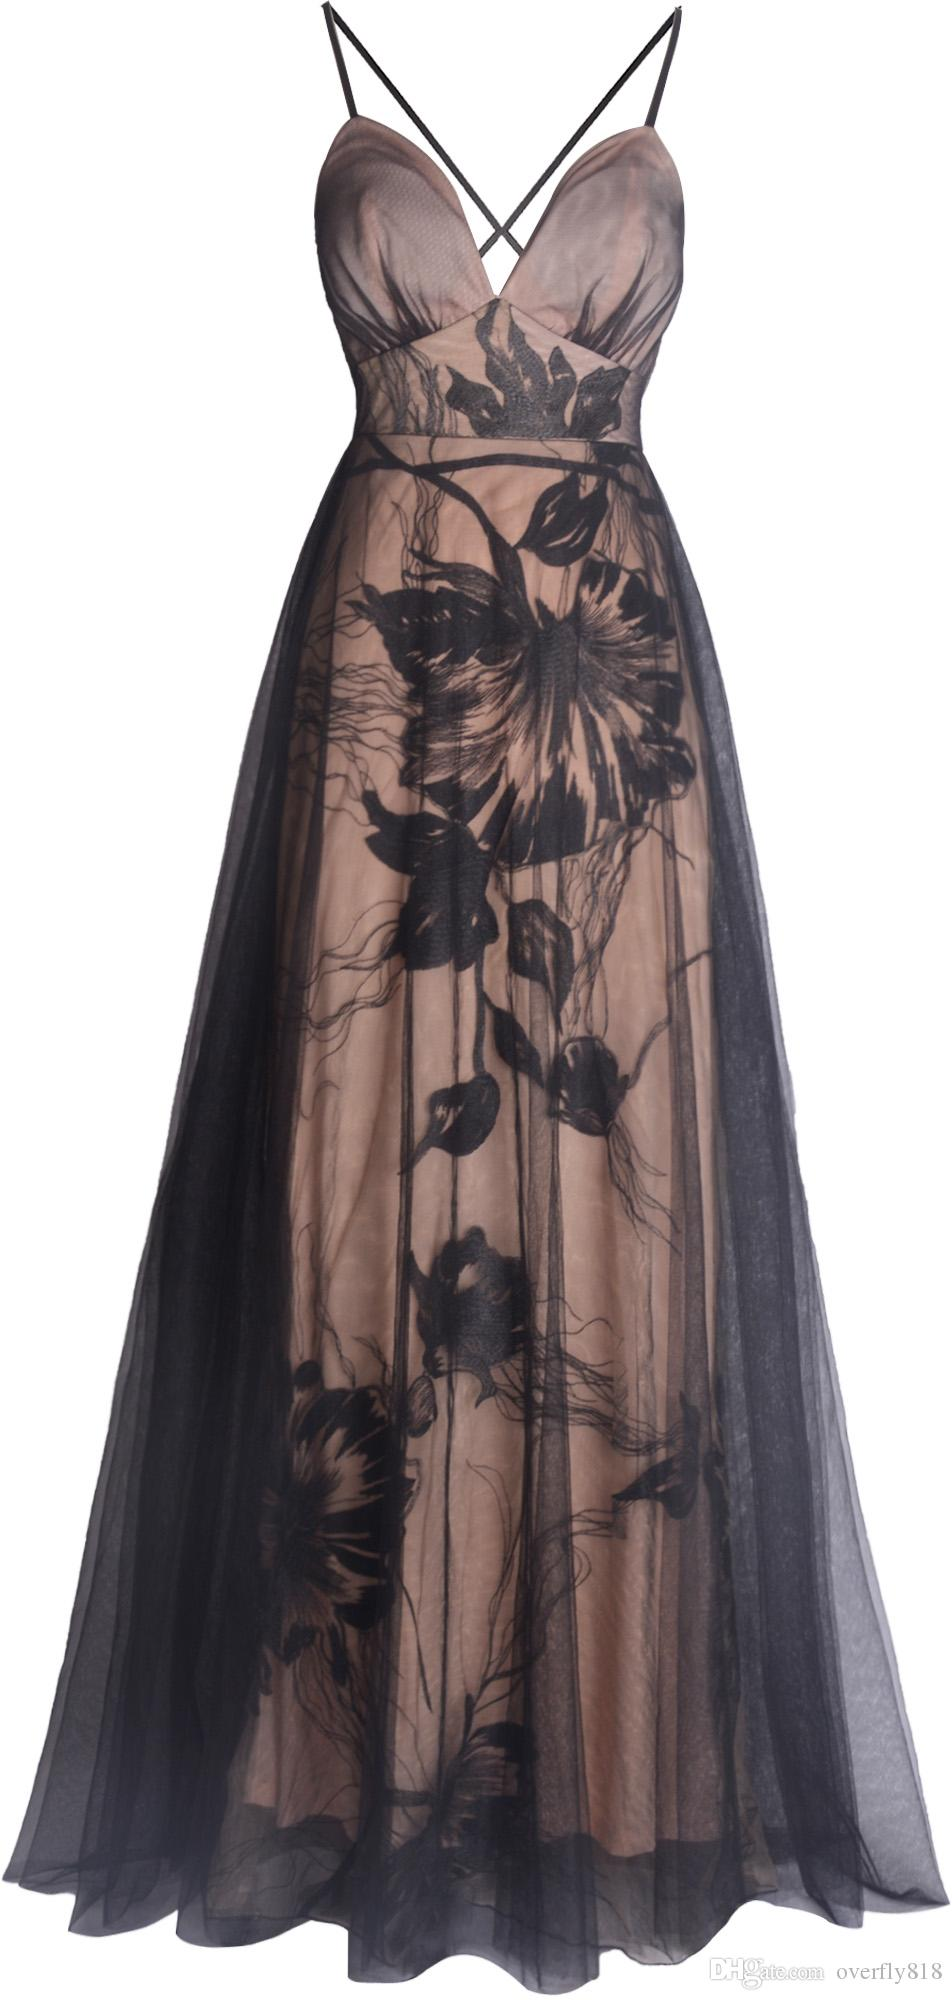 ad109a4d1 Fazadess Girl Women's Elegant deep-V Sleeveless Bridesmaid Maxi Grenadine  Long Swing Party Dress